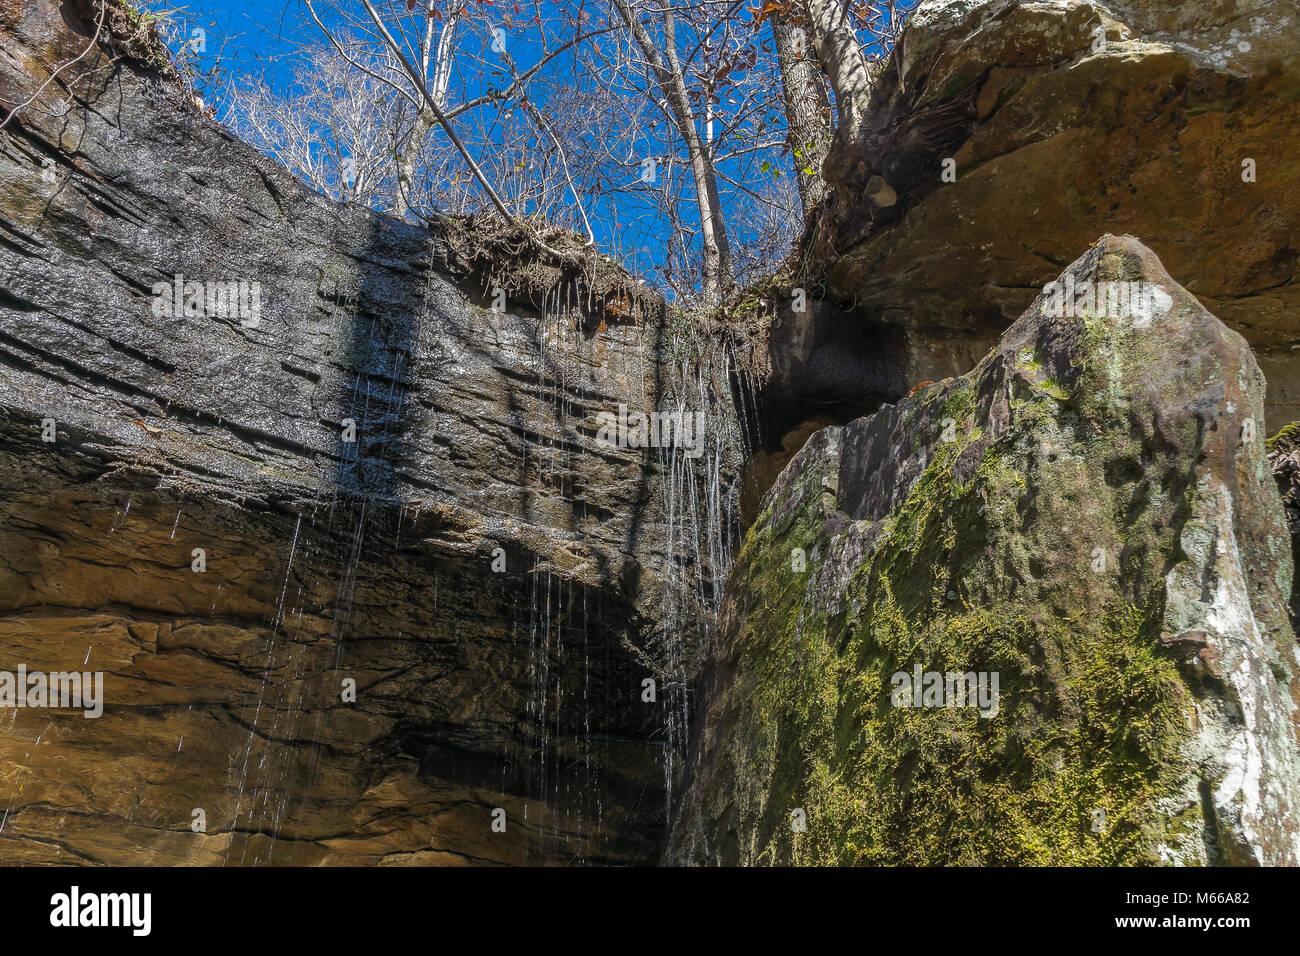 An appalachian mountain waterfall. - Stock Image